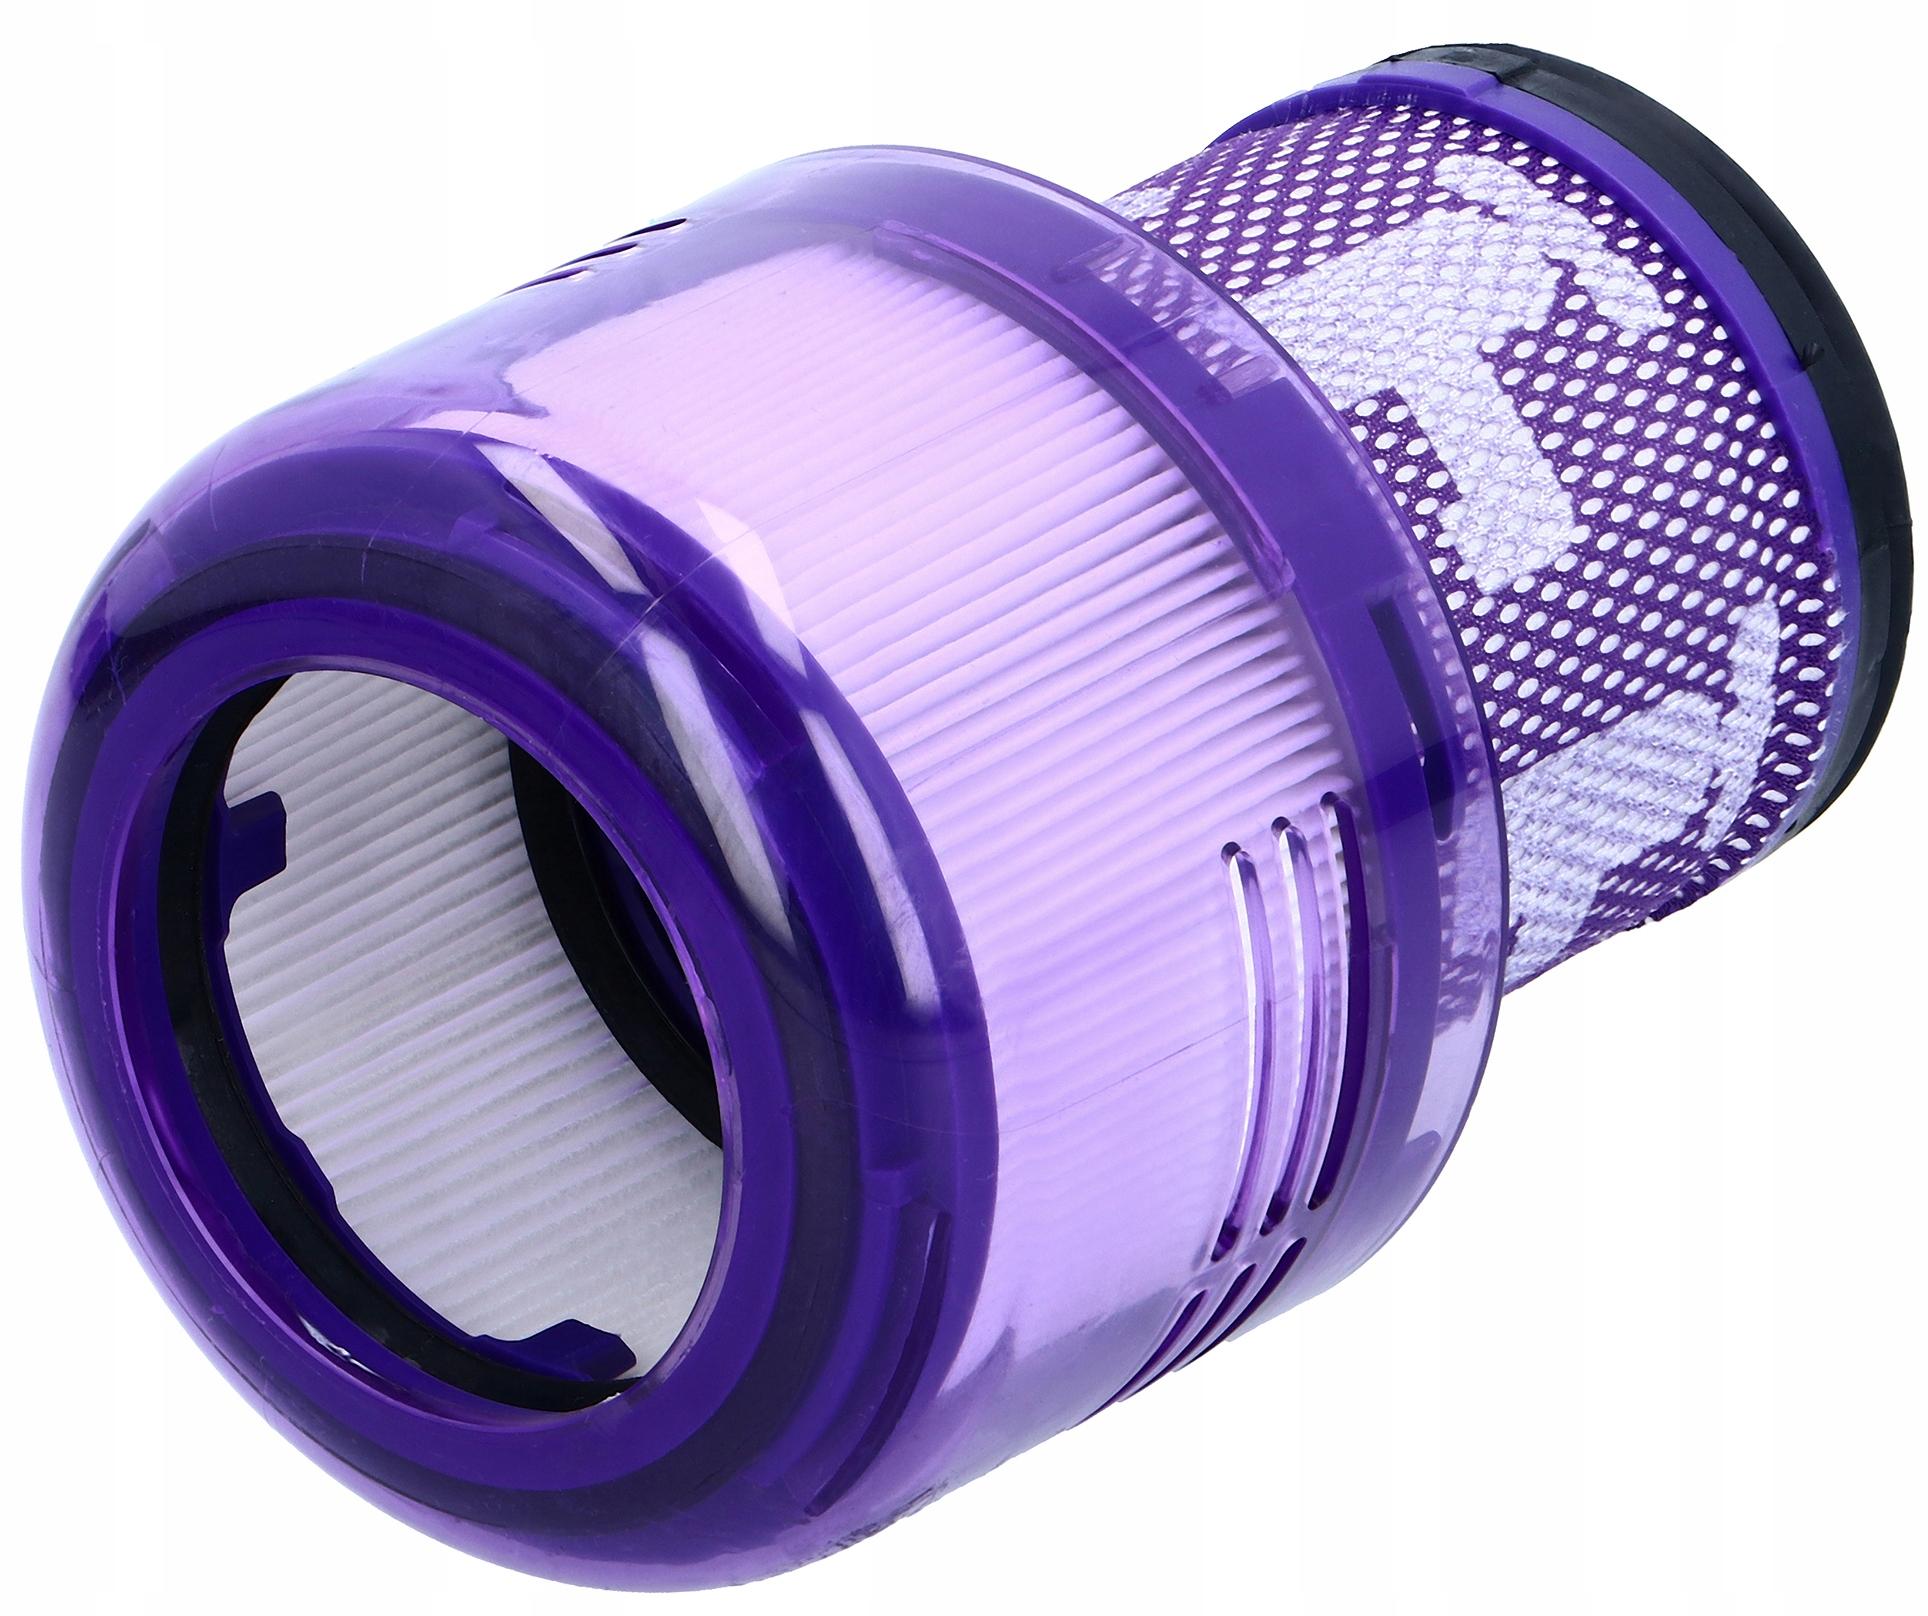 Umývateľný filter pre Dyson V11 Absolute Pro